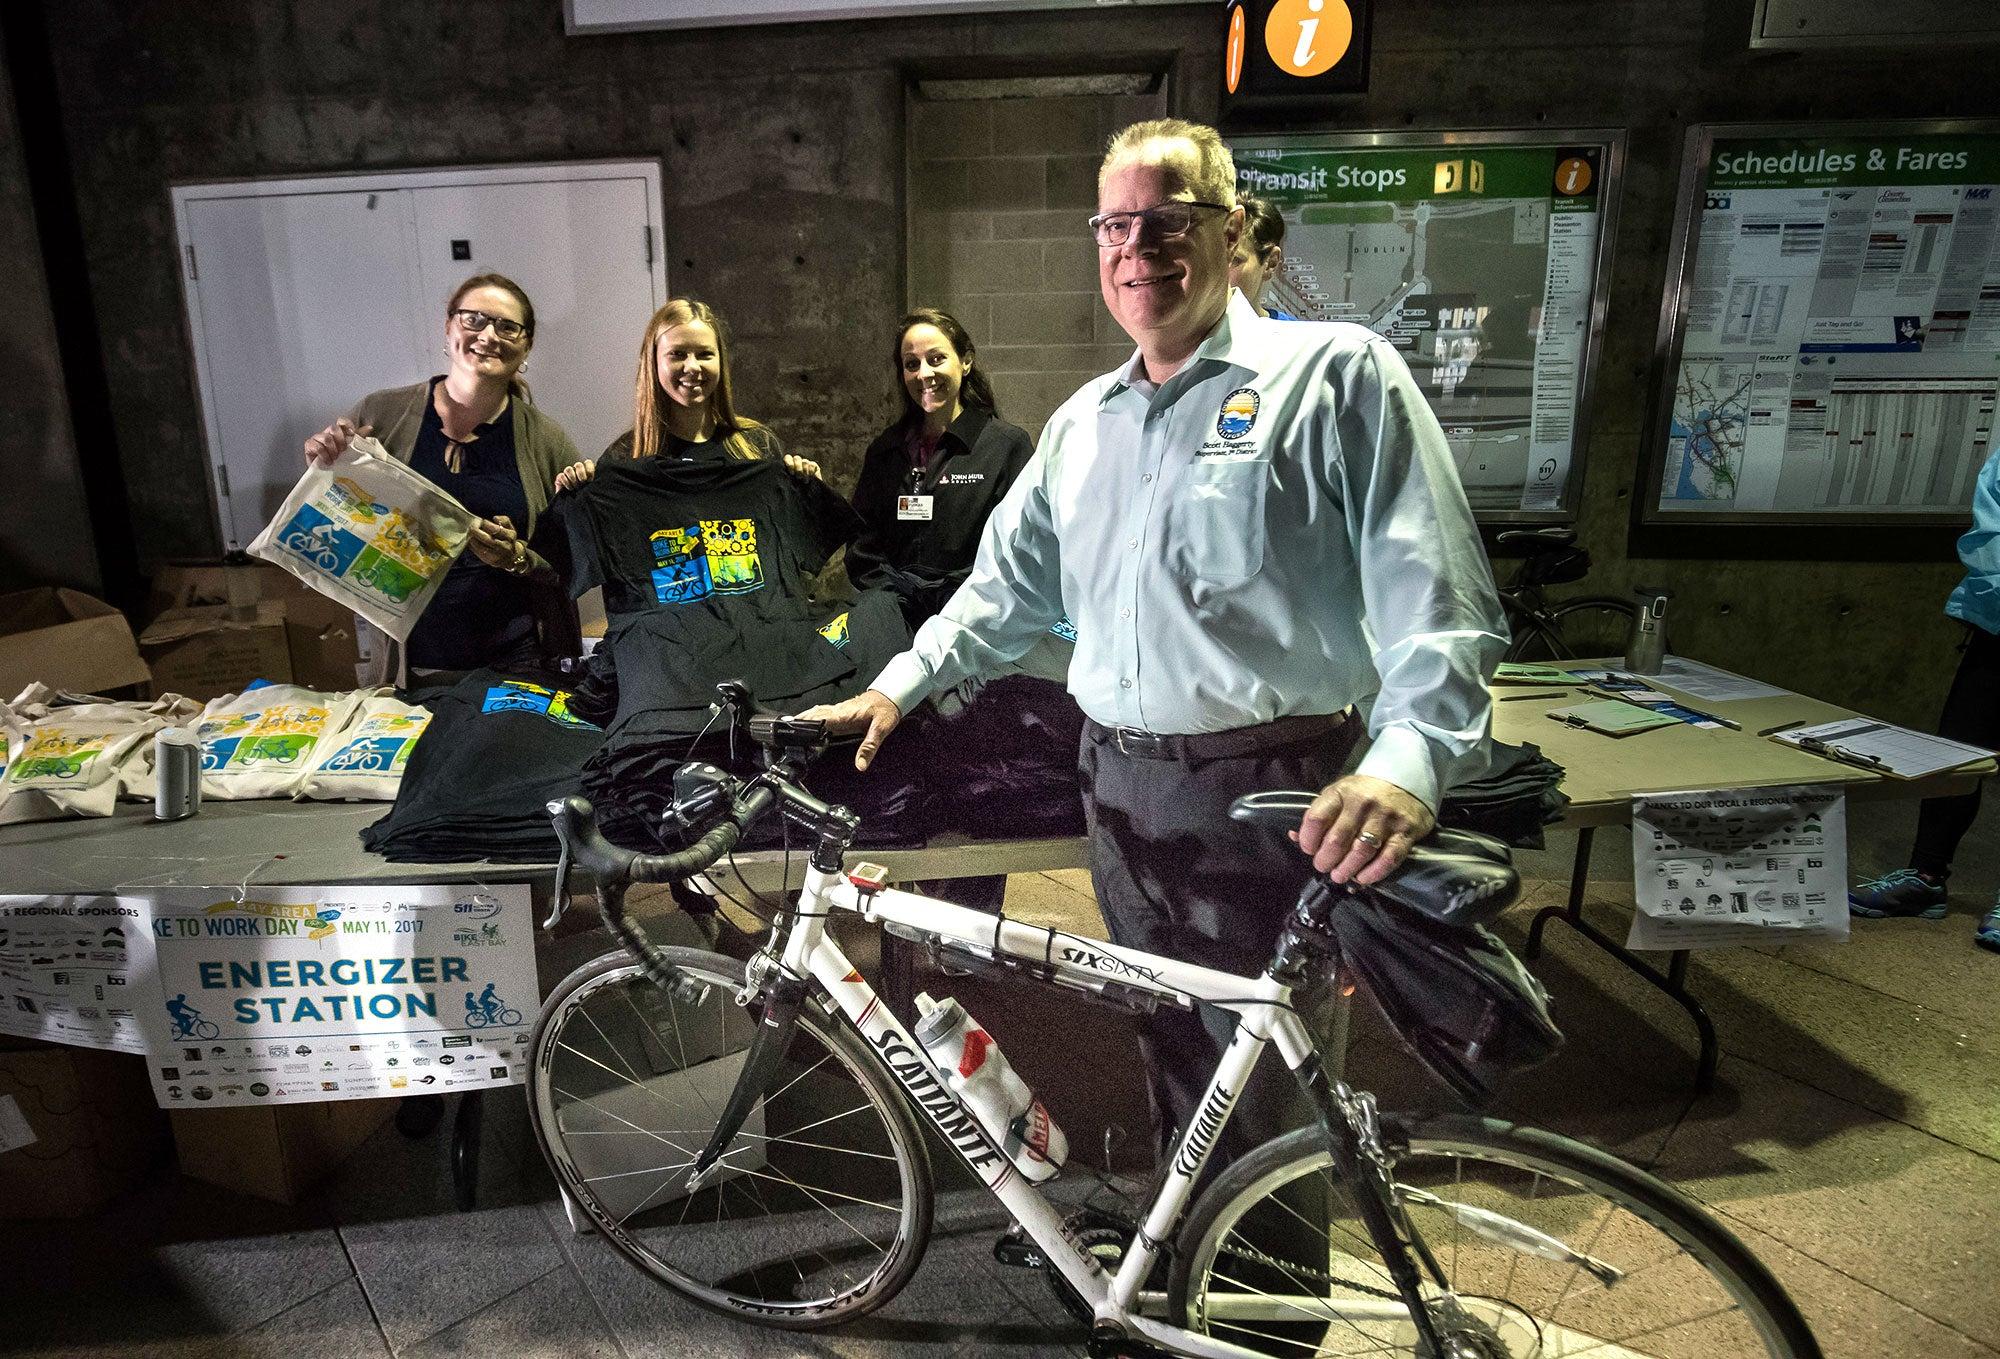 MTC Vice Chair and Alameda County Supervisor Scott Haggerty at the Dublin/Pleasanton BART station